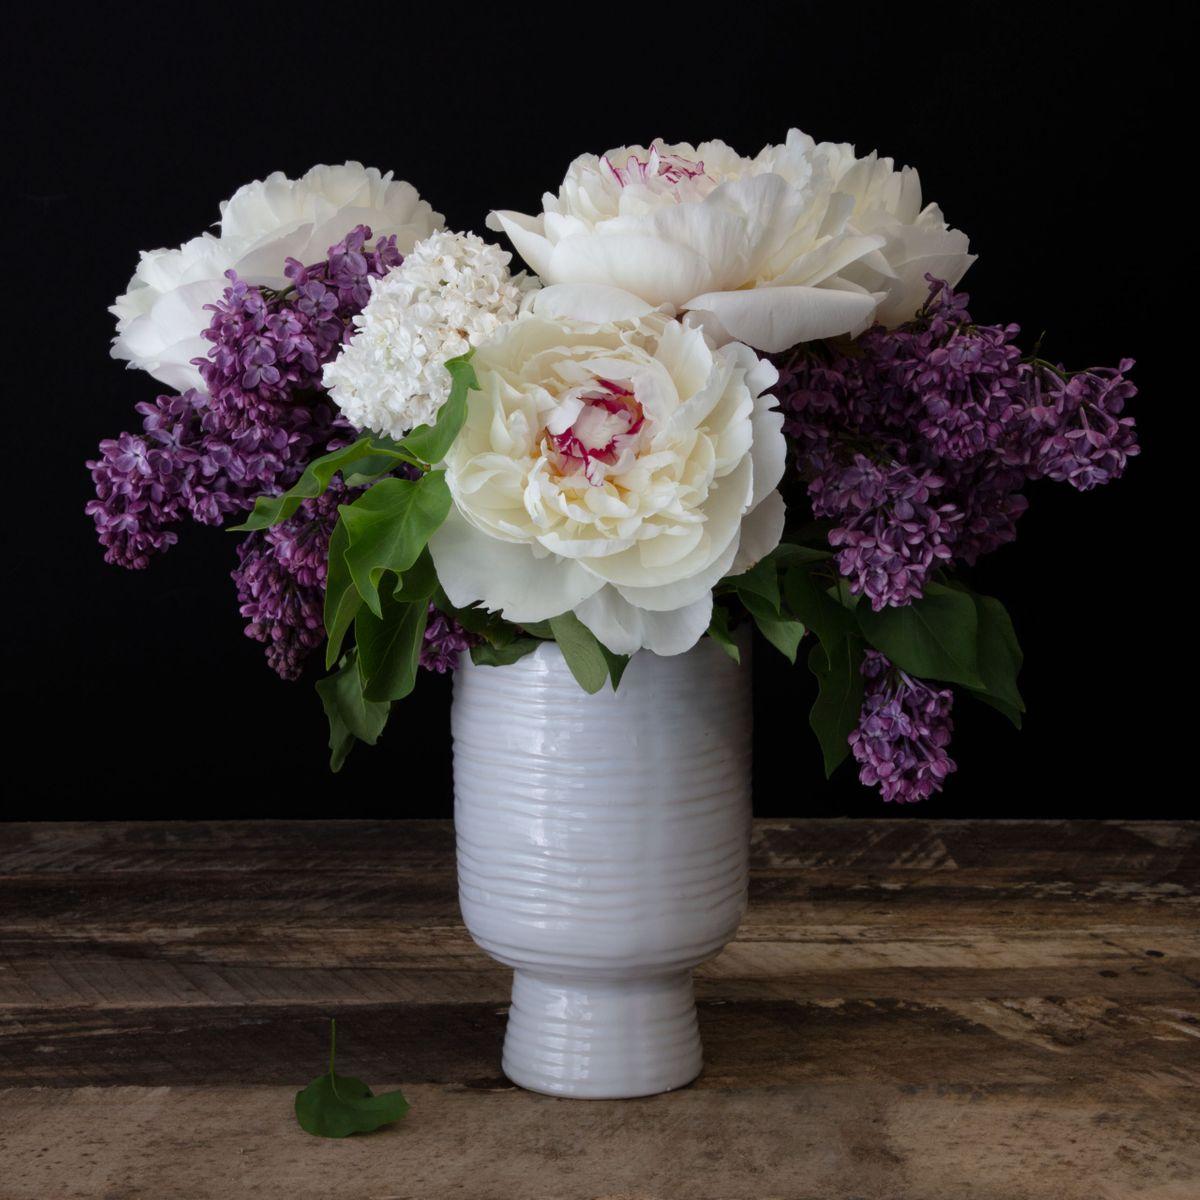 Roses_LB_04.jpg